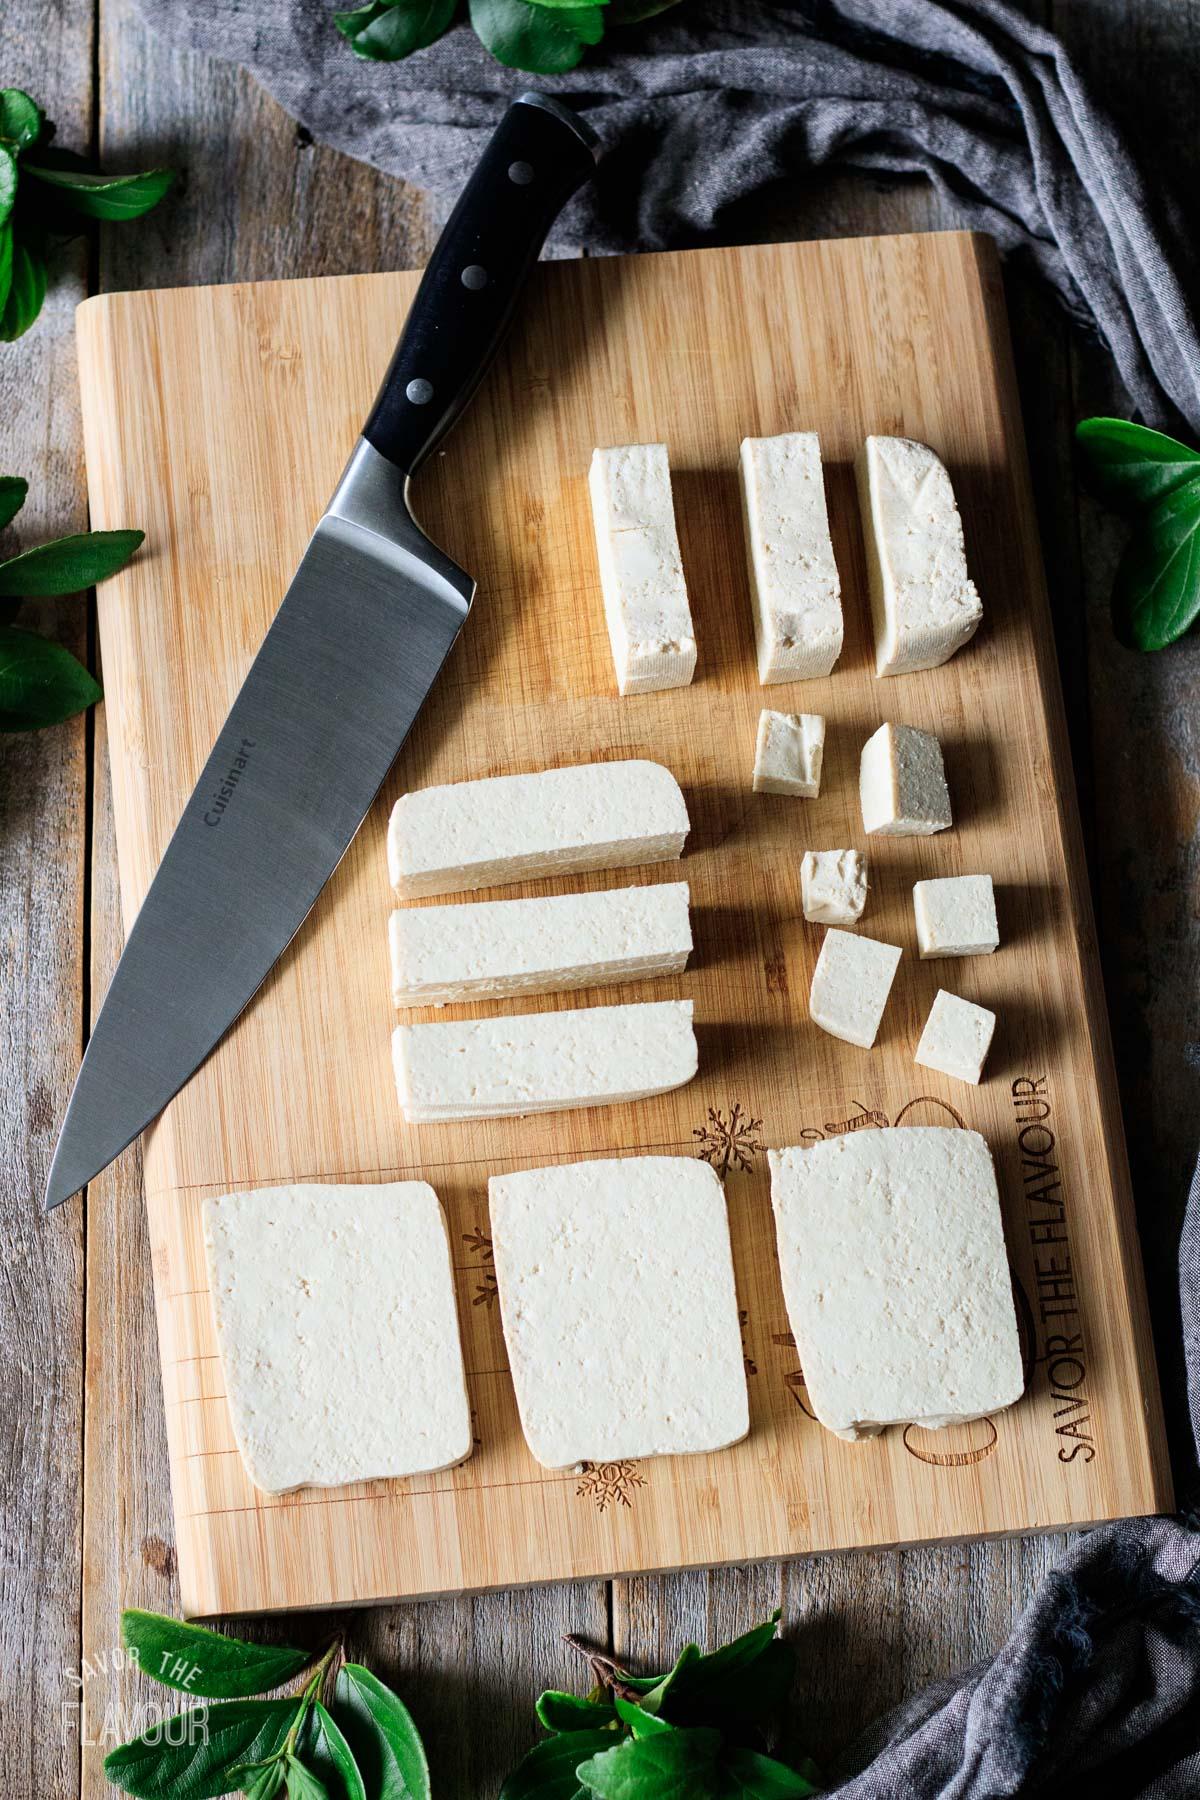 cutting the tofu into cubes on a bamboo cutting board